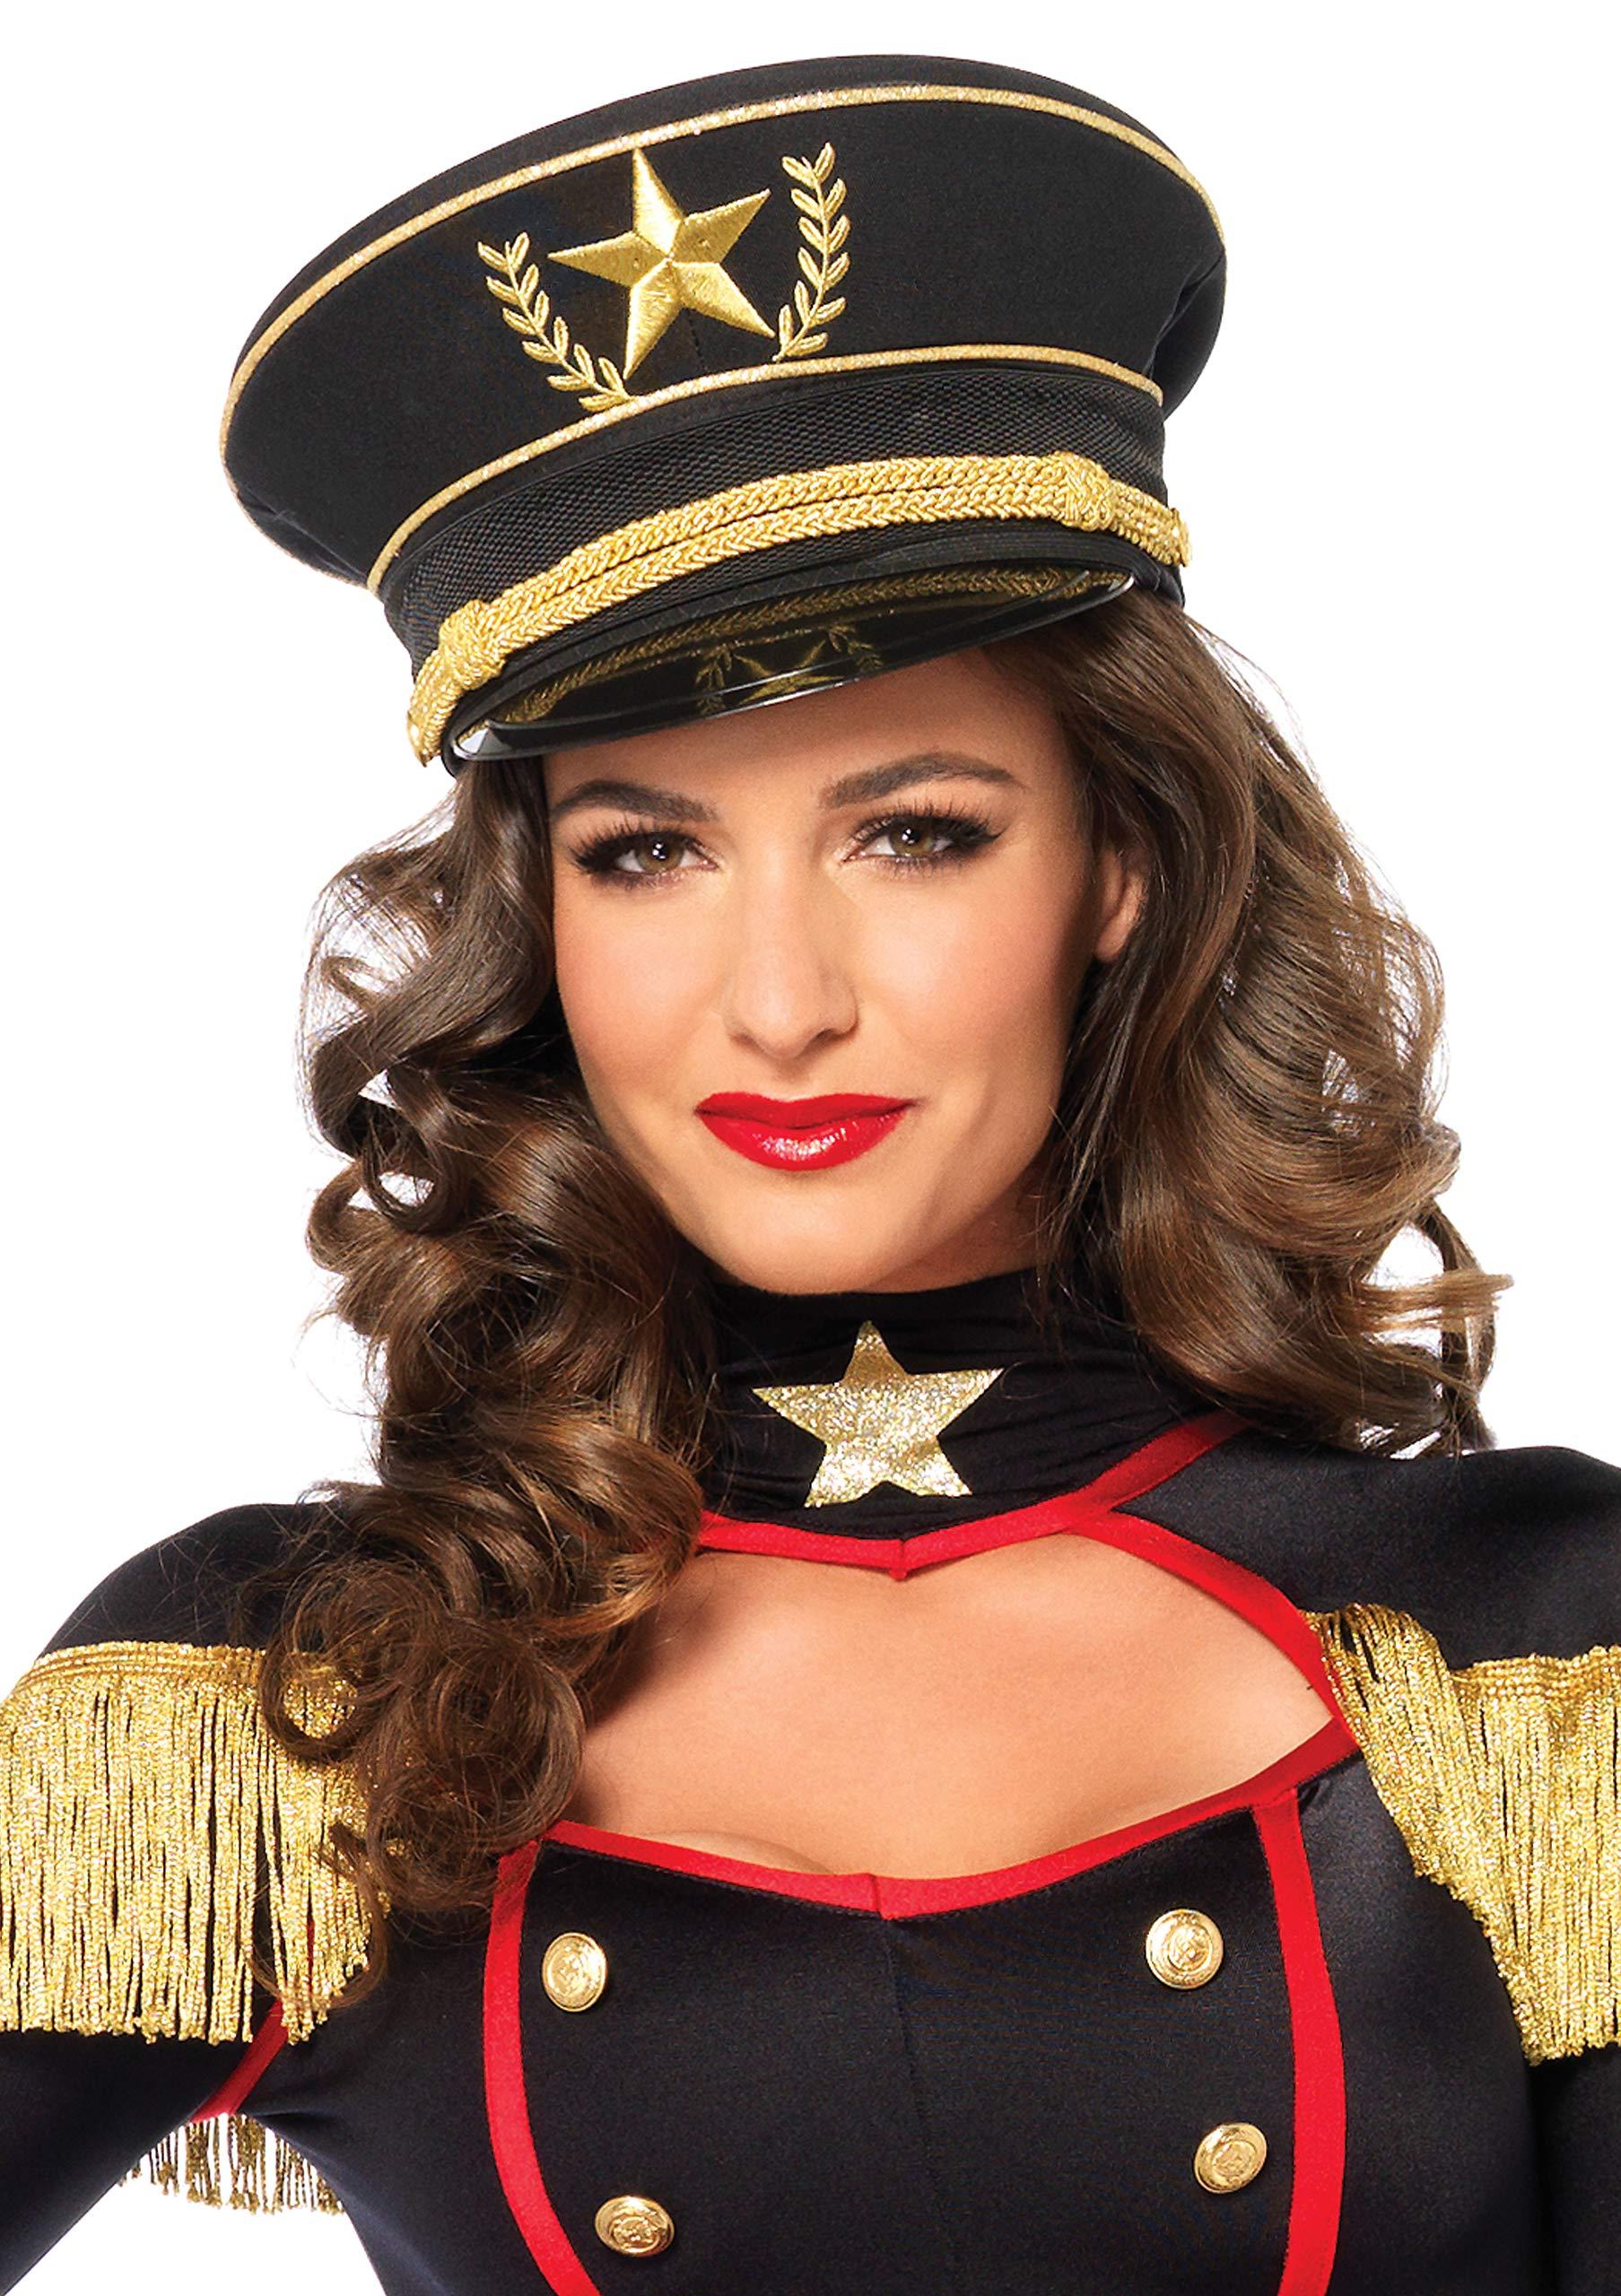 Leg Avenue Women's Military Hat Costume Accessory, Black, One Size